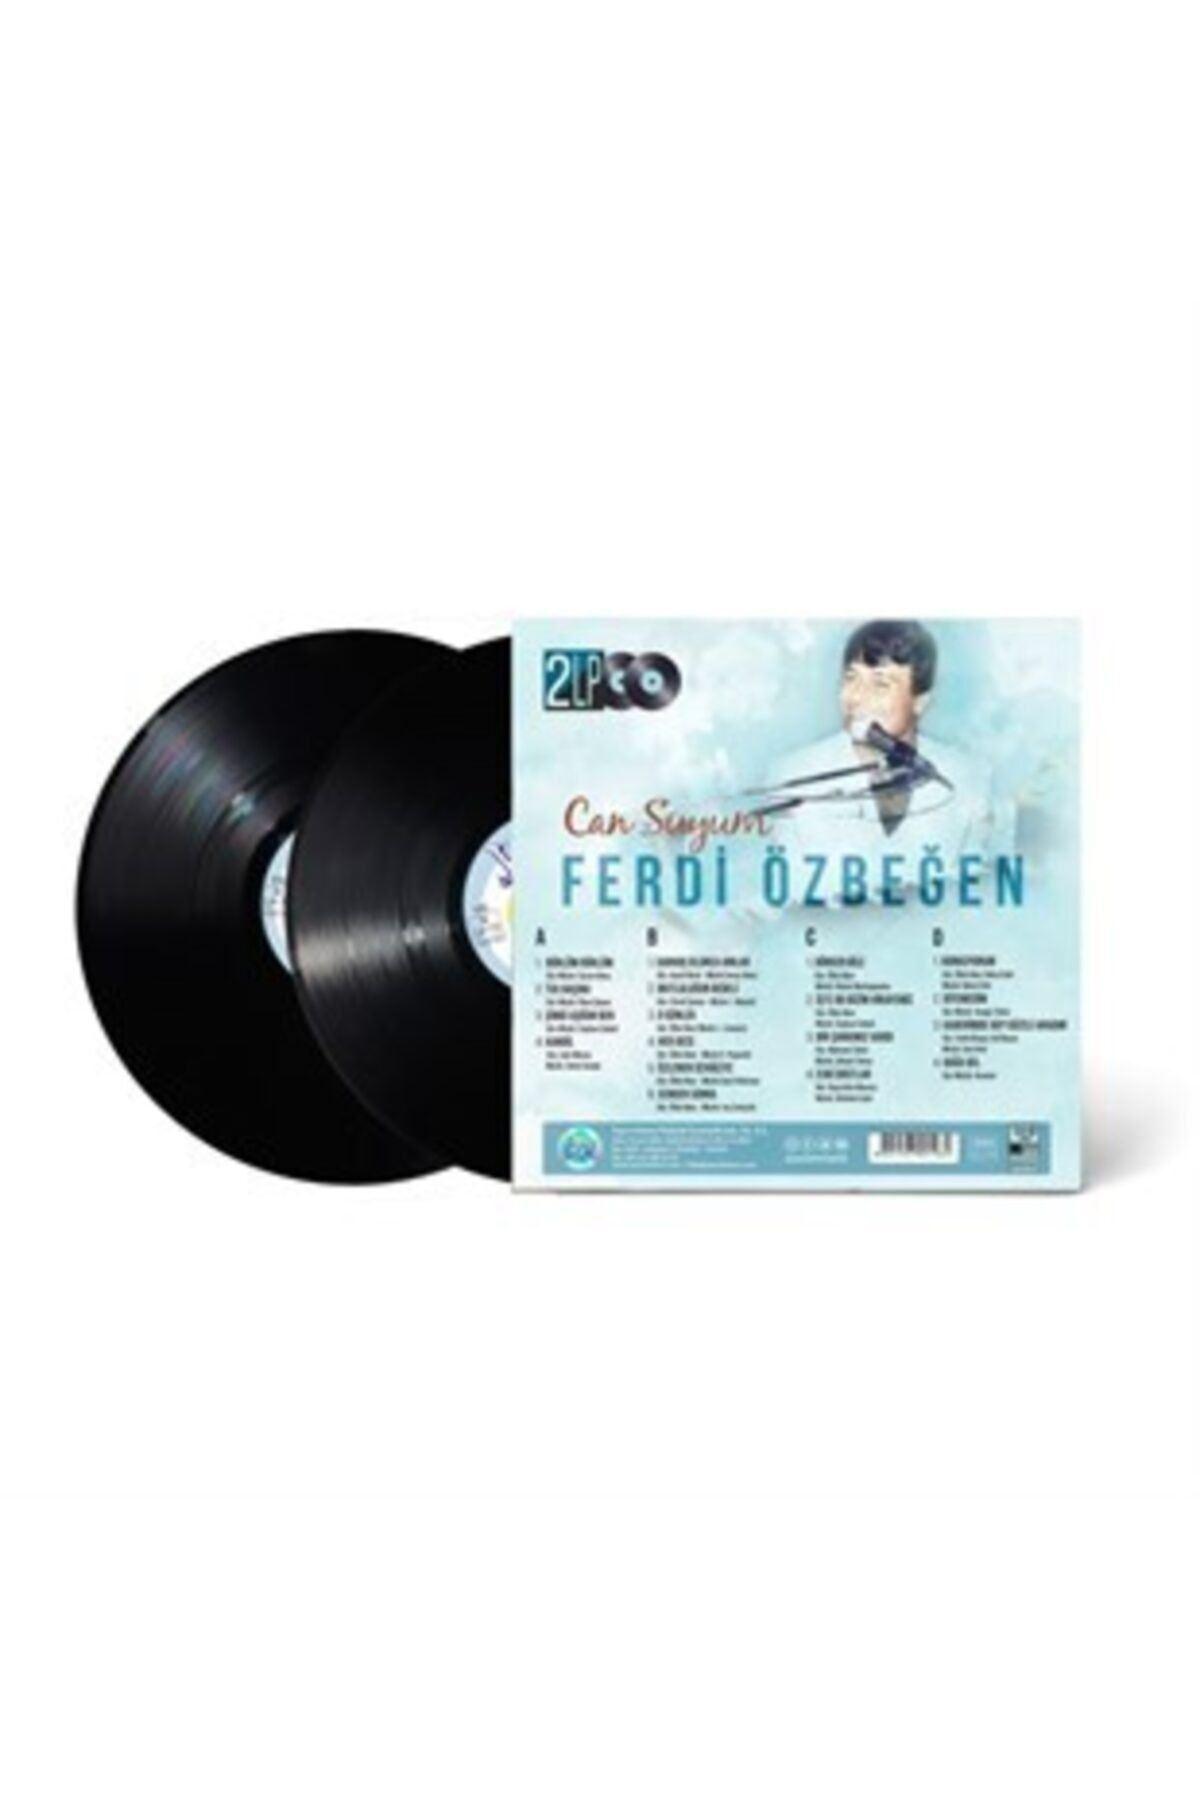 Ferdi Özbeğen - Can Suyum  33'Lük Plak Ambalajında (2 LP PLAK)